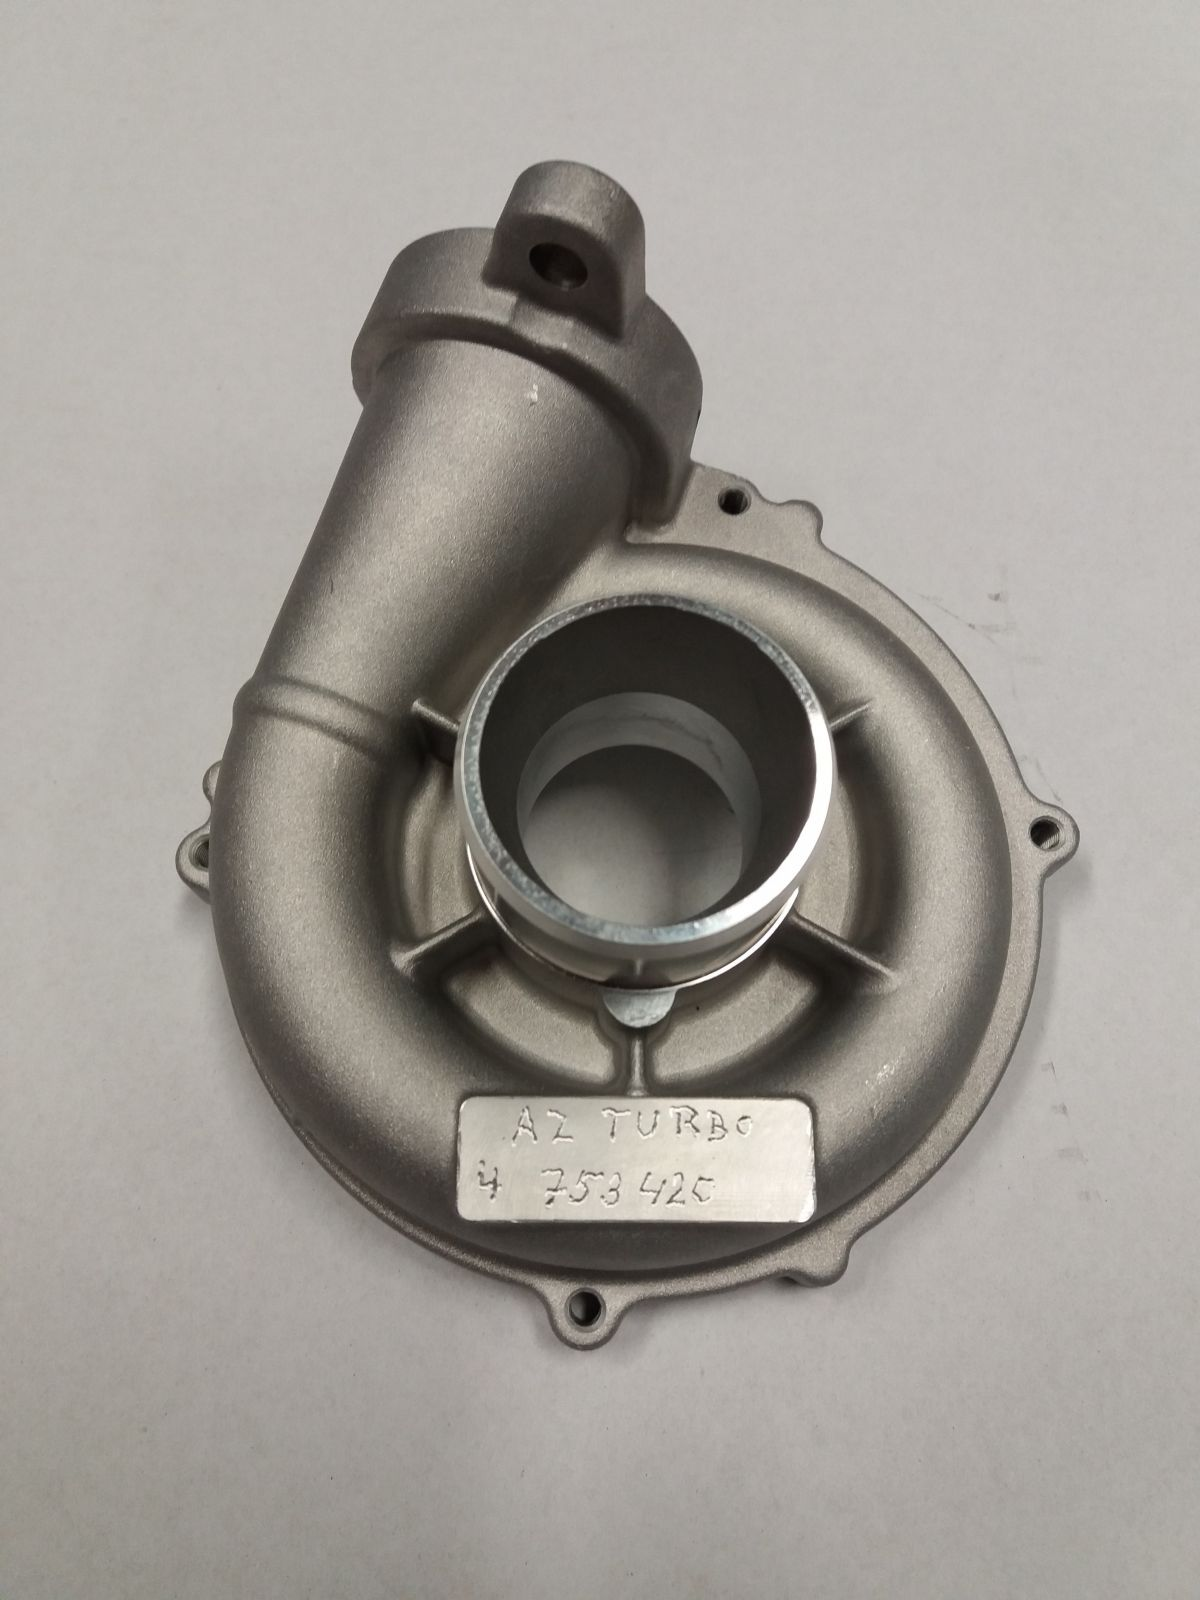 Sací komora turbodmychadla Peugeot 207 1,6HDi, 80kW, rv. 04-, Motor: DV6TED4 GARRETT